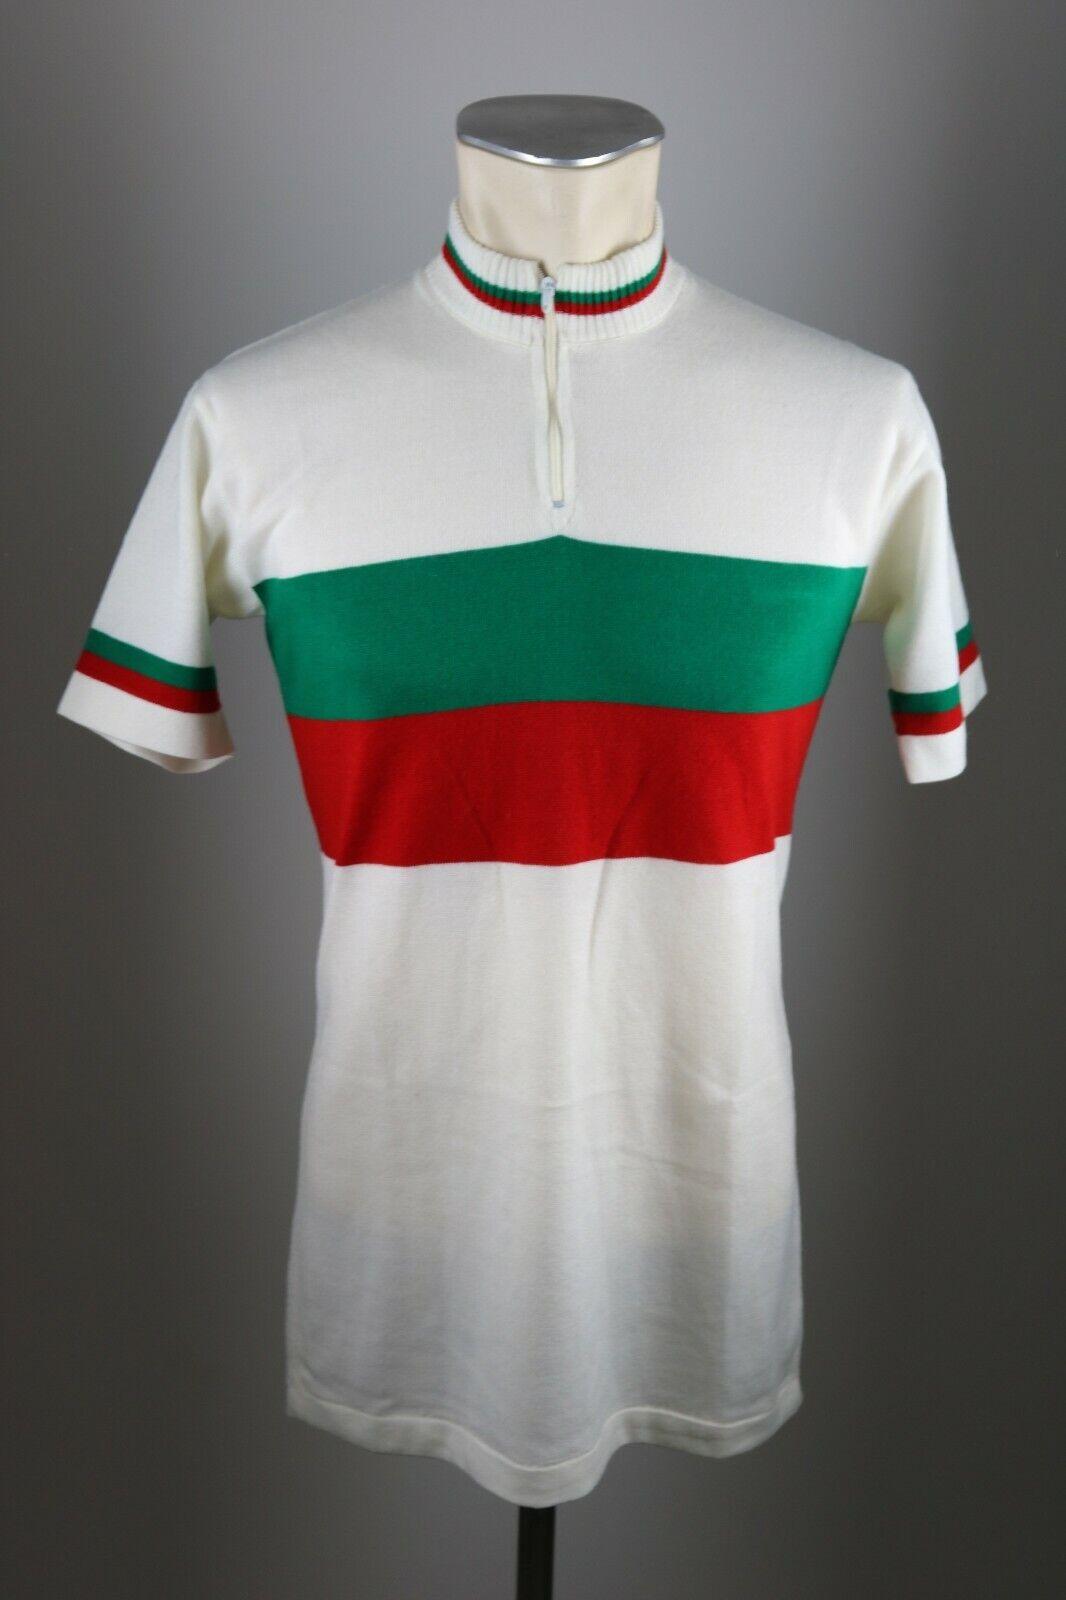 70s   80s vintage Radfahren Rad Trikot weiß Gr. M 50cm BW Fahrrad jersey Acrylic AQ4